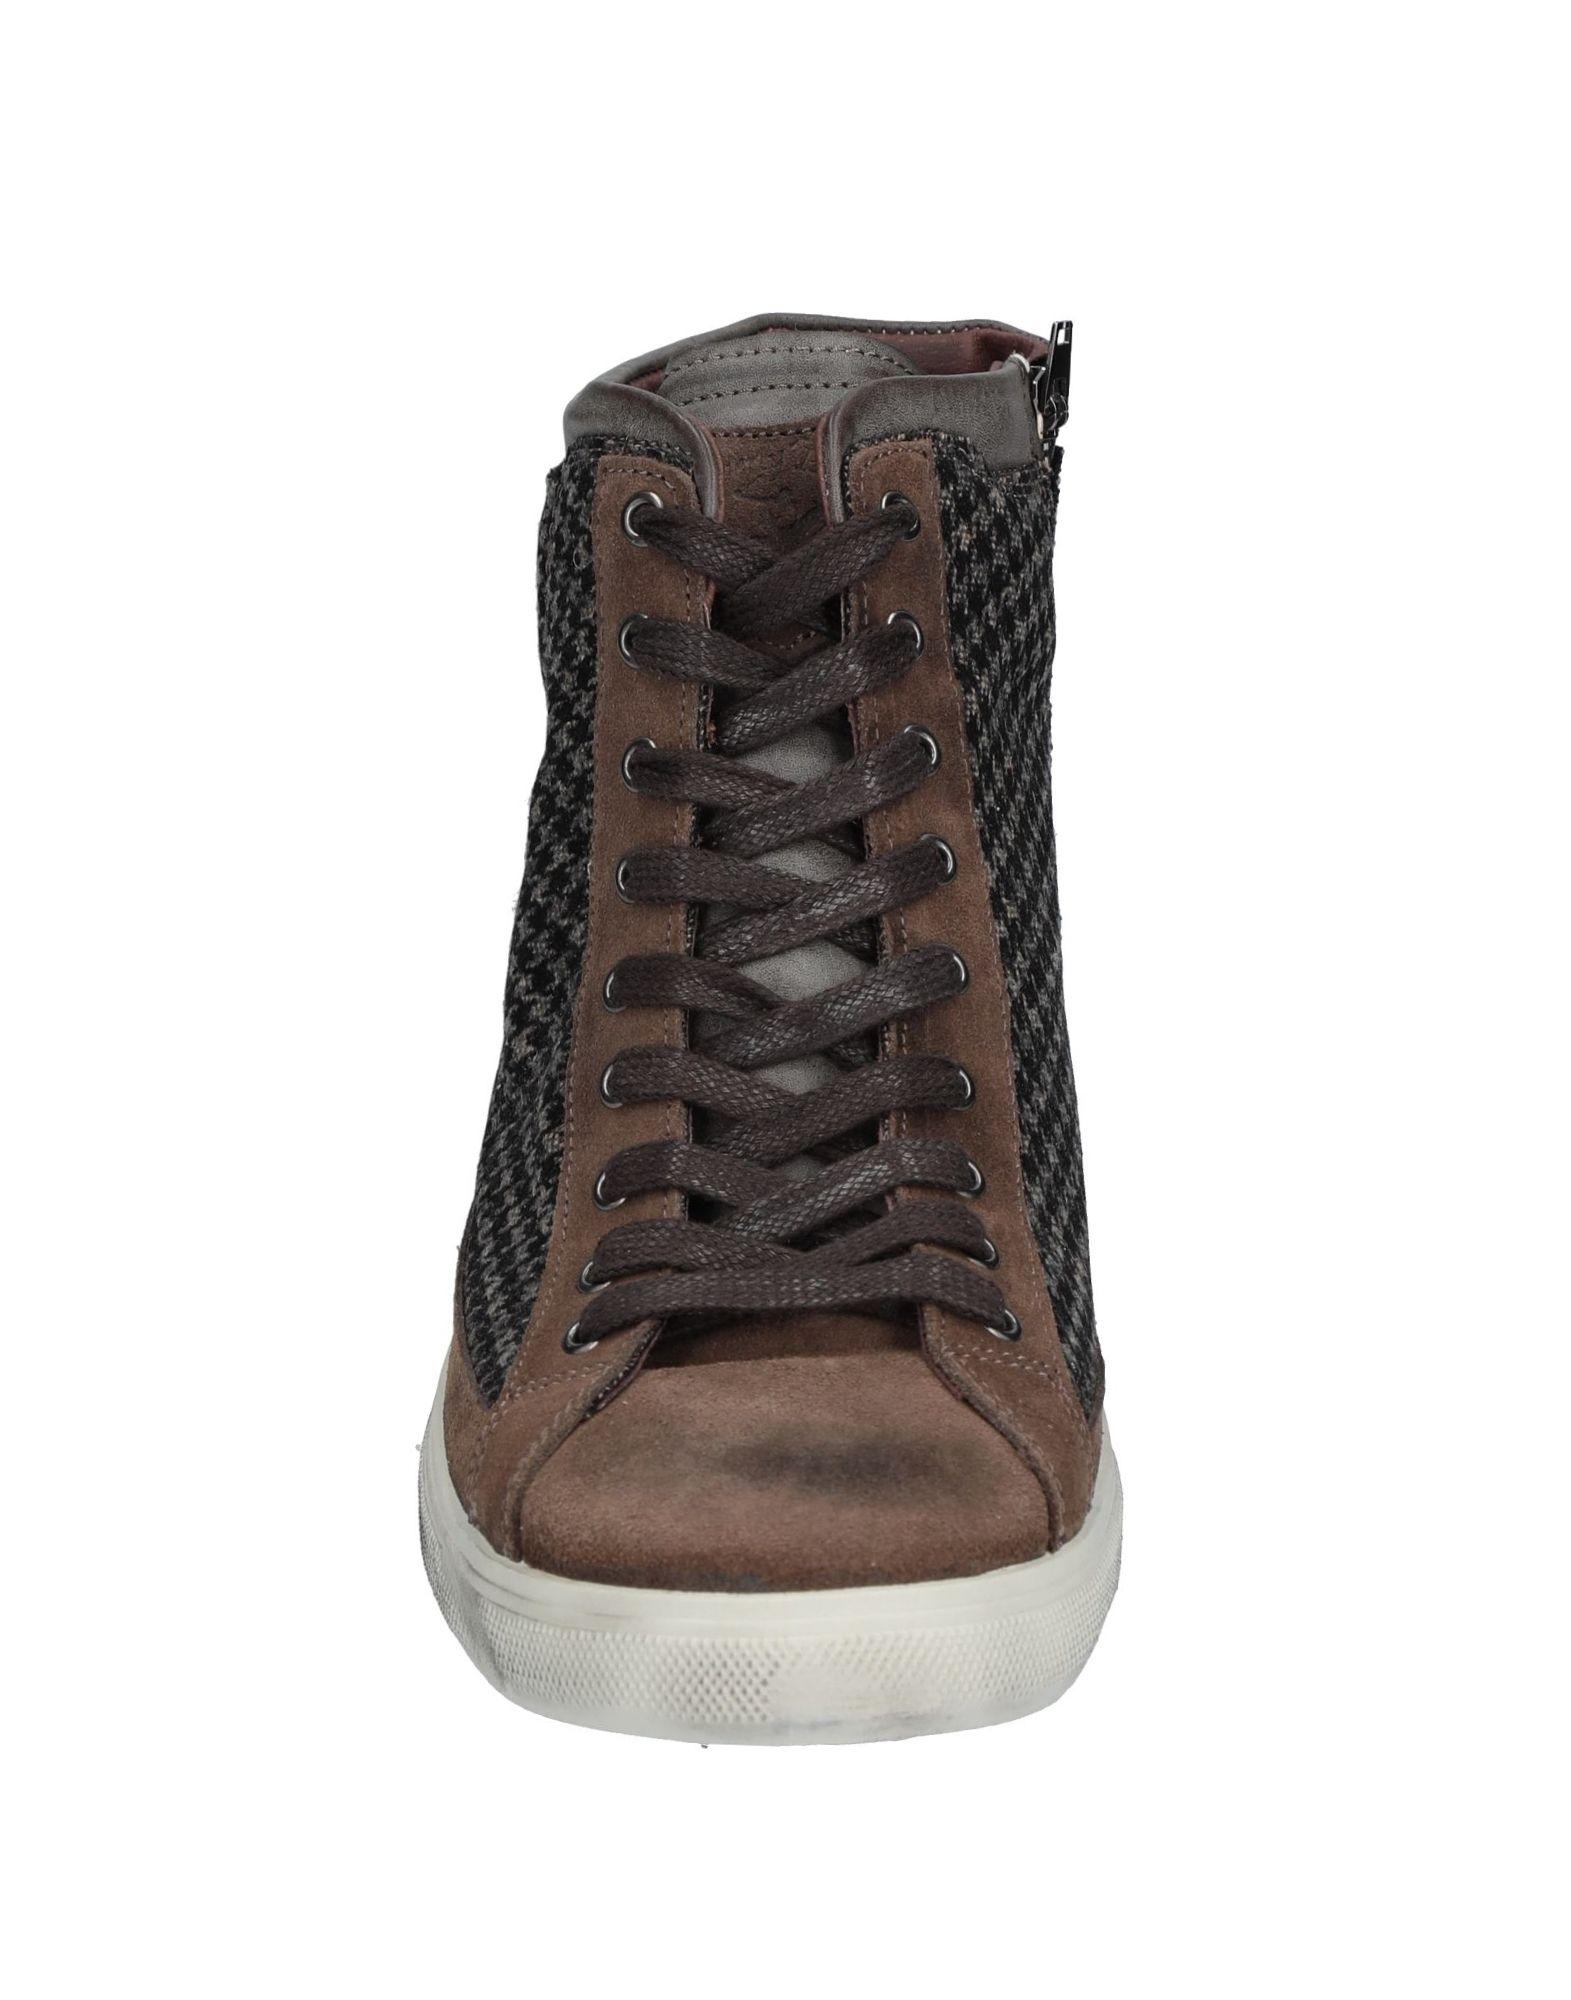 Rabatt Club echte Schuhe Beverly Hills Polo Club Rabatt Sneakers Herren  11528255GX 34c392